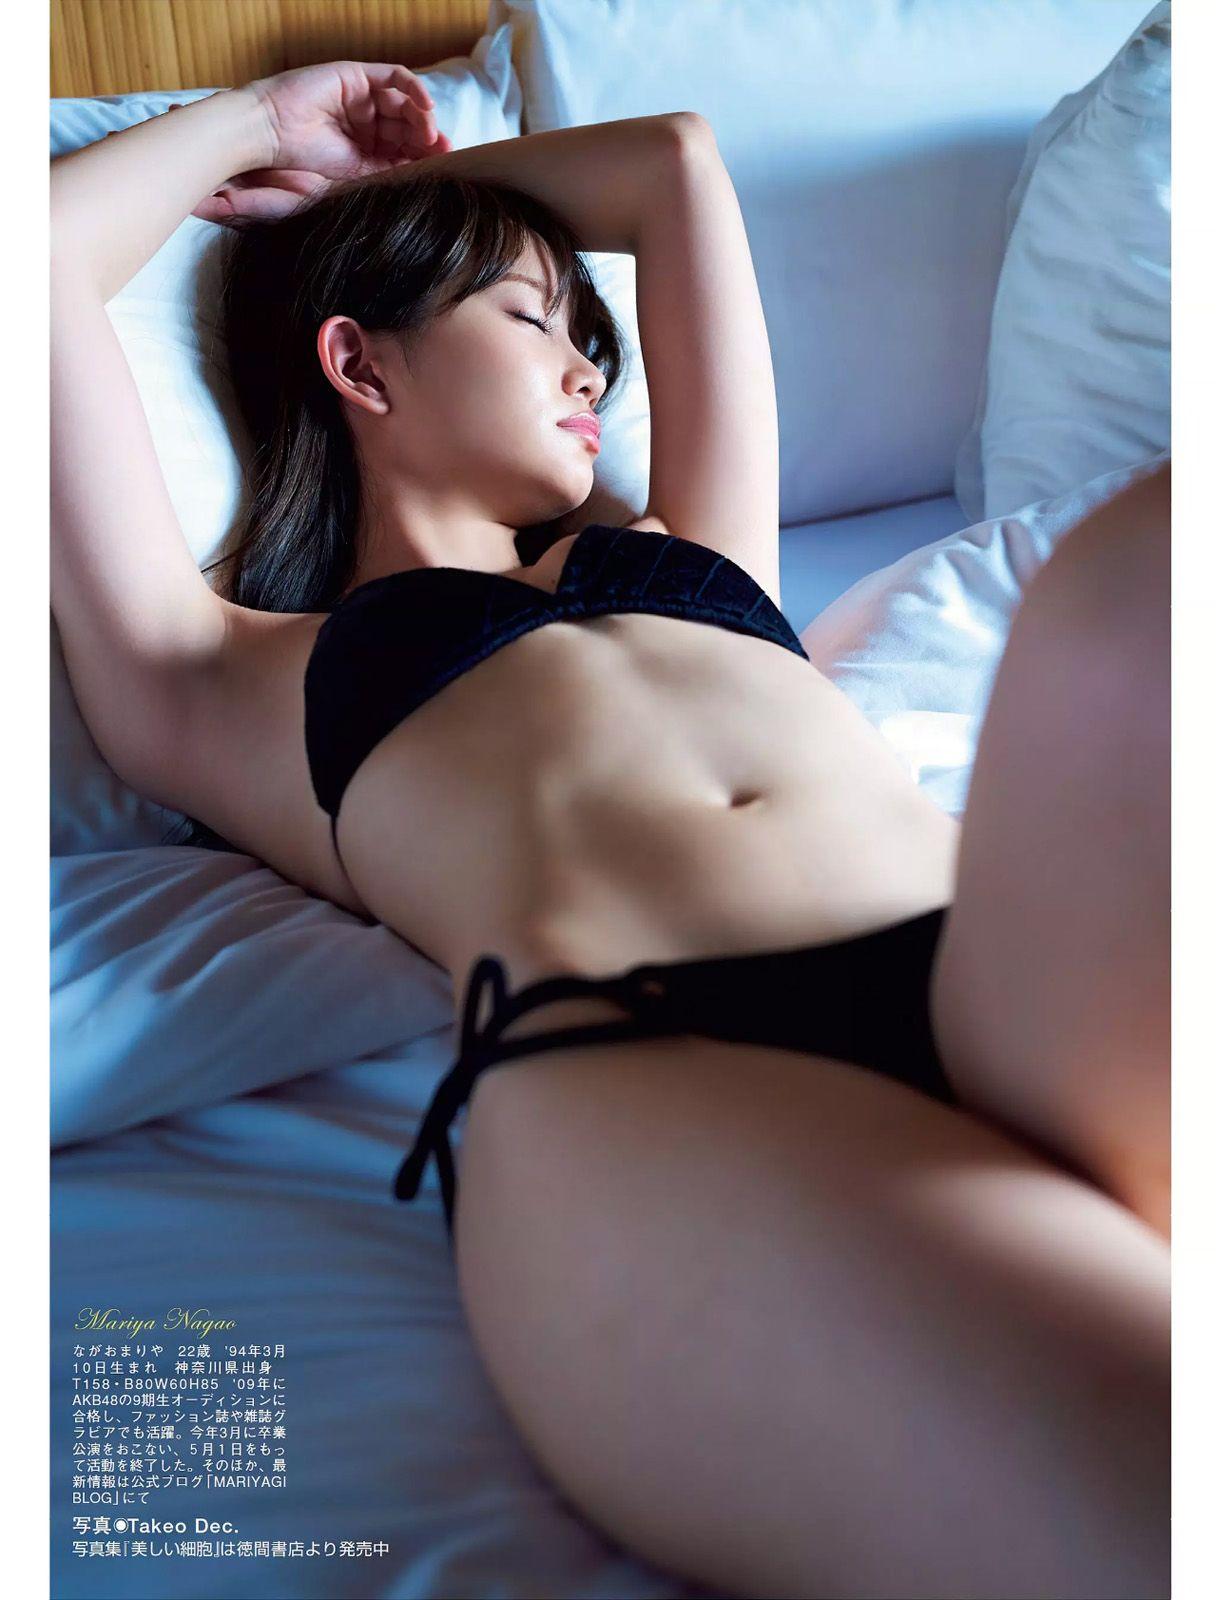 Nagao Mariya 永尾まりや AKB48, FLASH Magazine 2016.05.31 Gravure